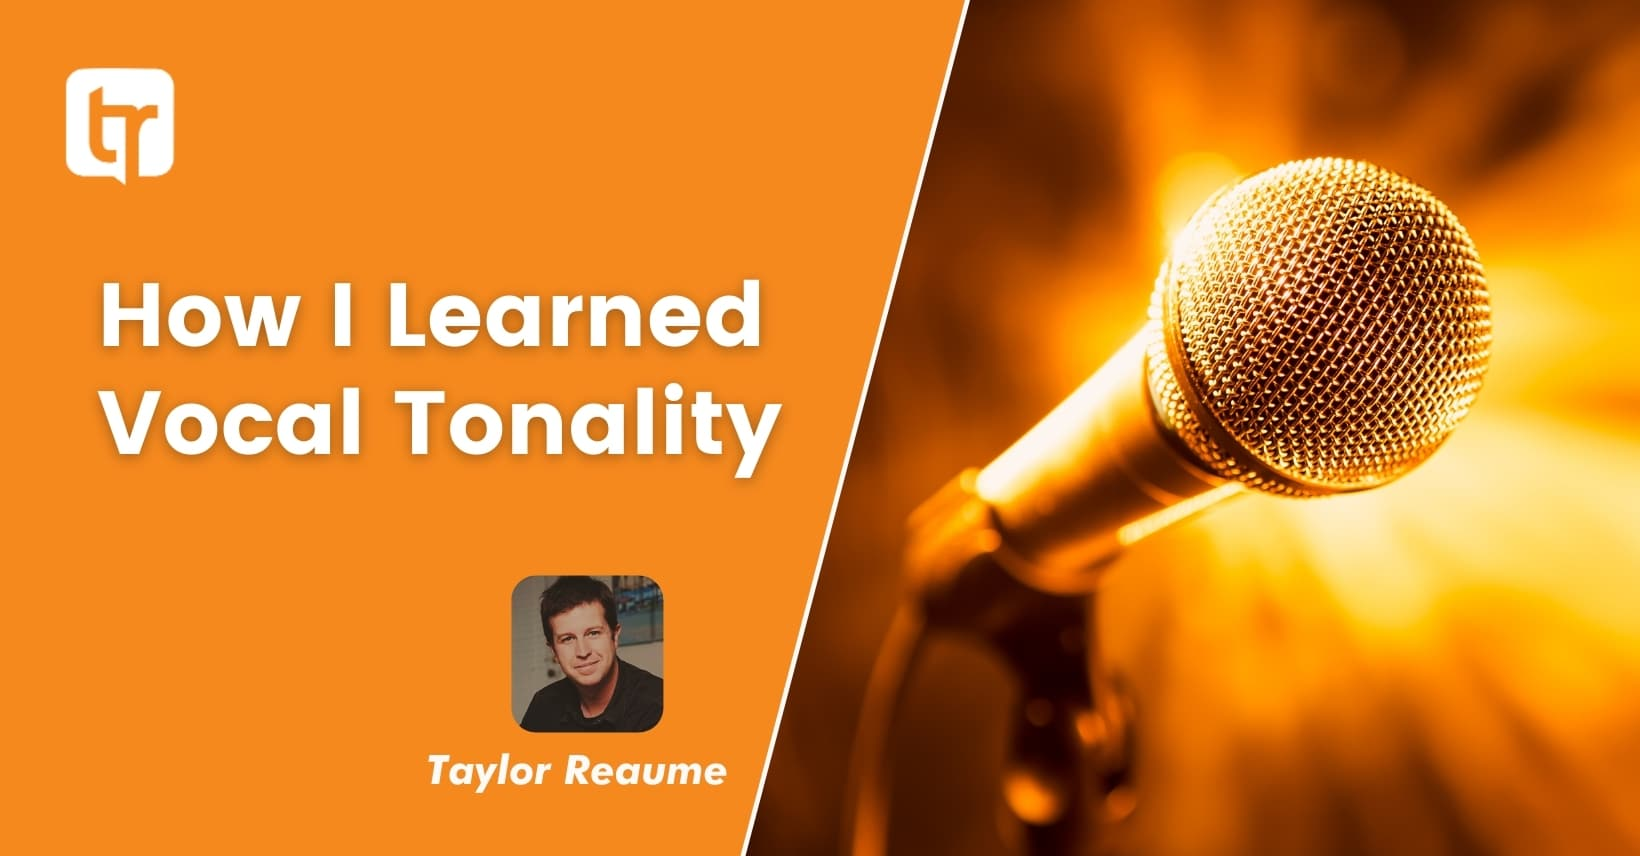 How I Learned Vocal Tonality